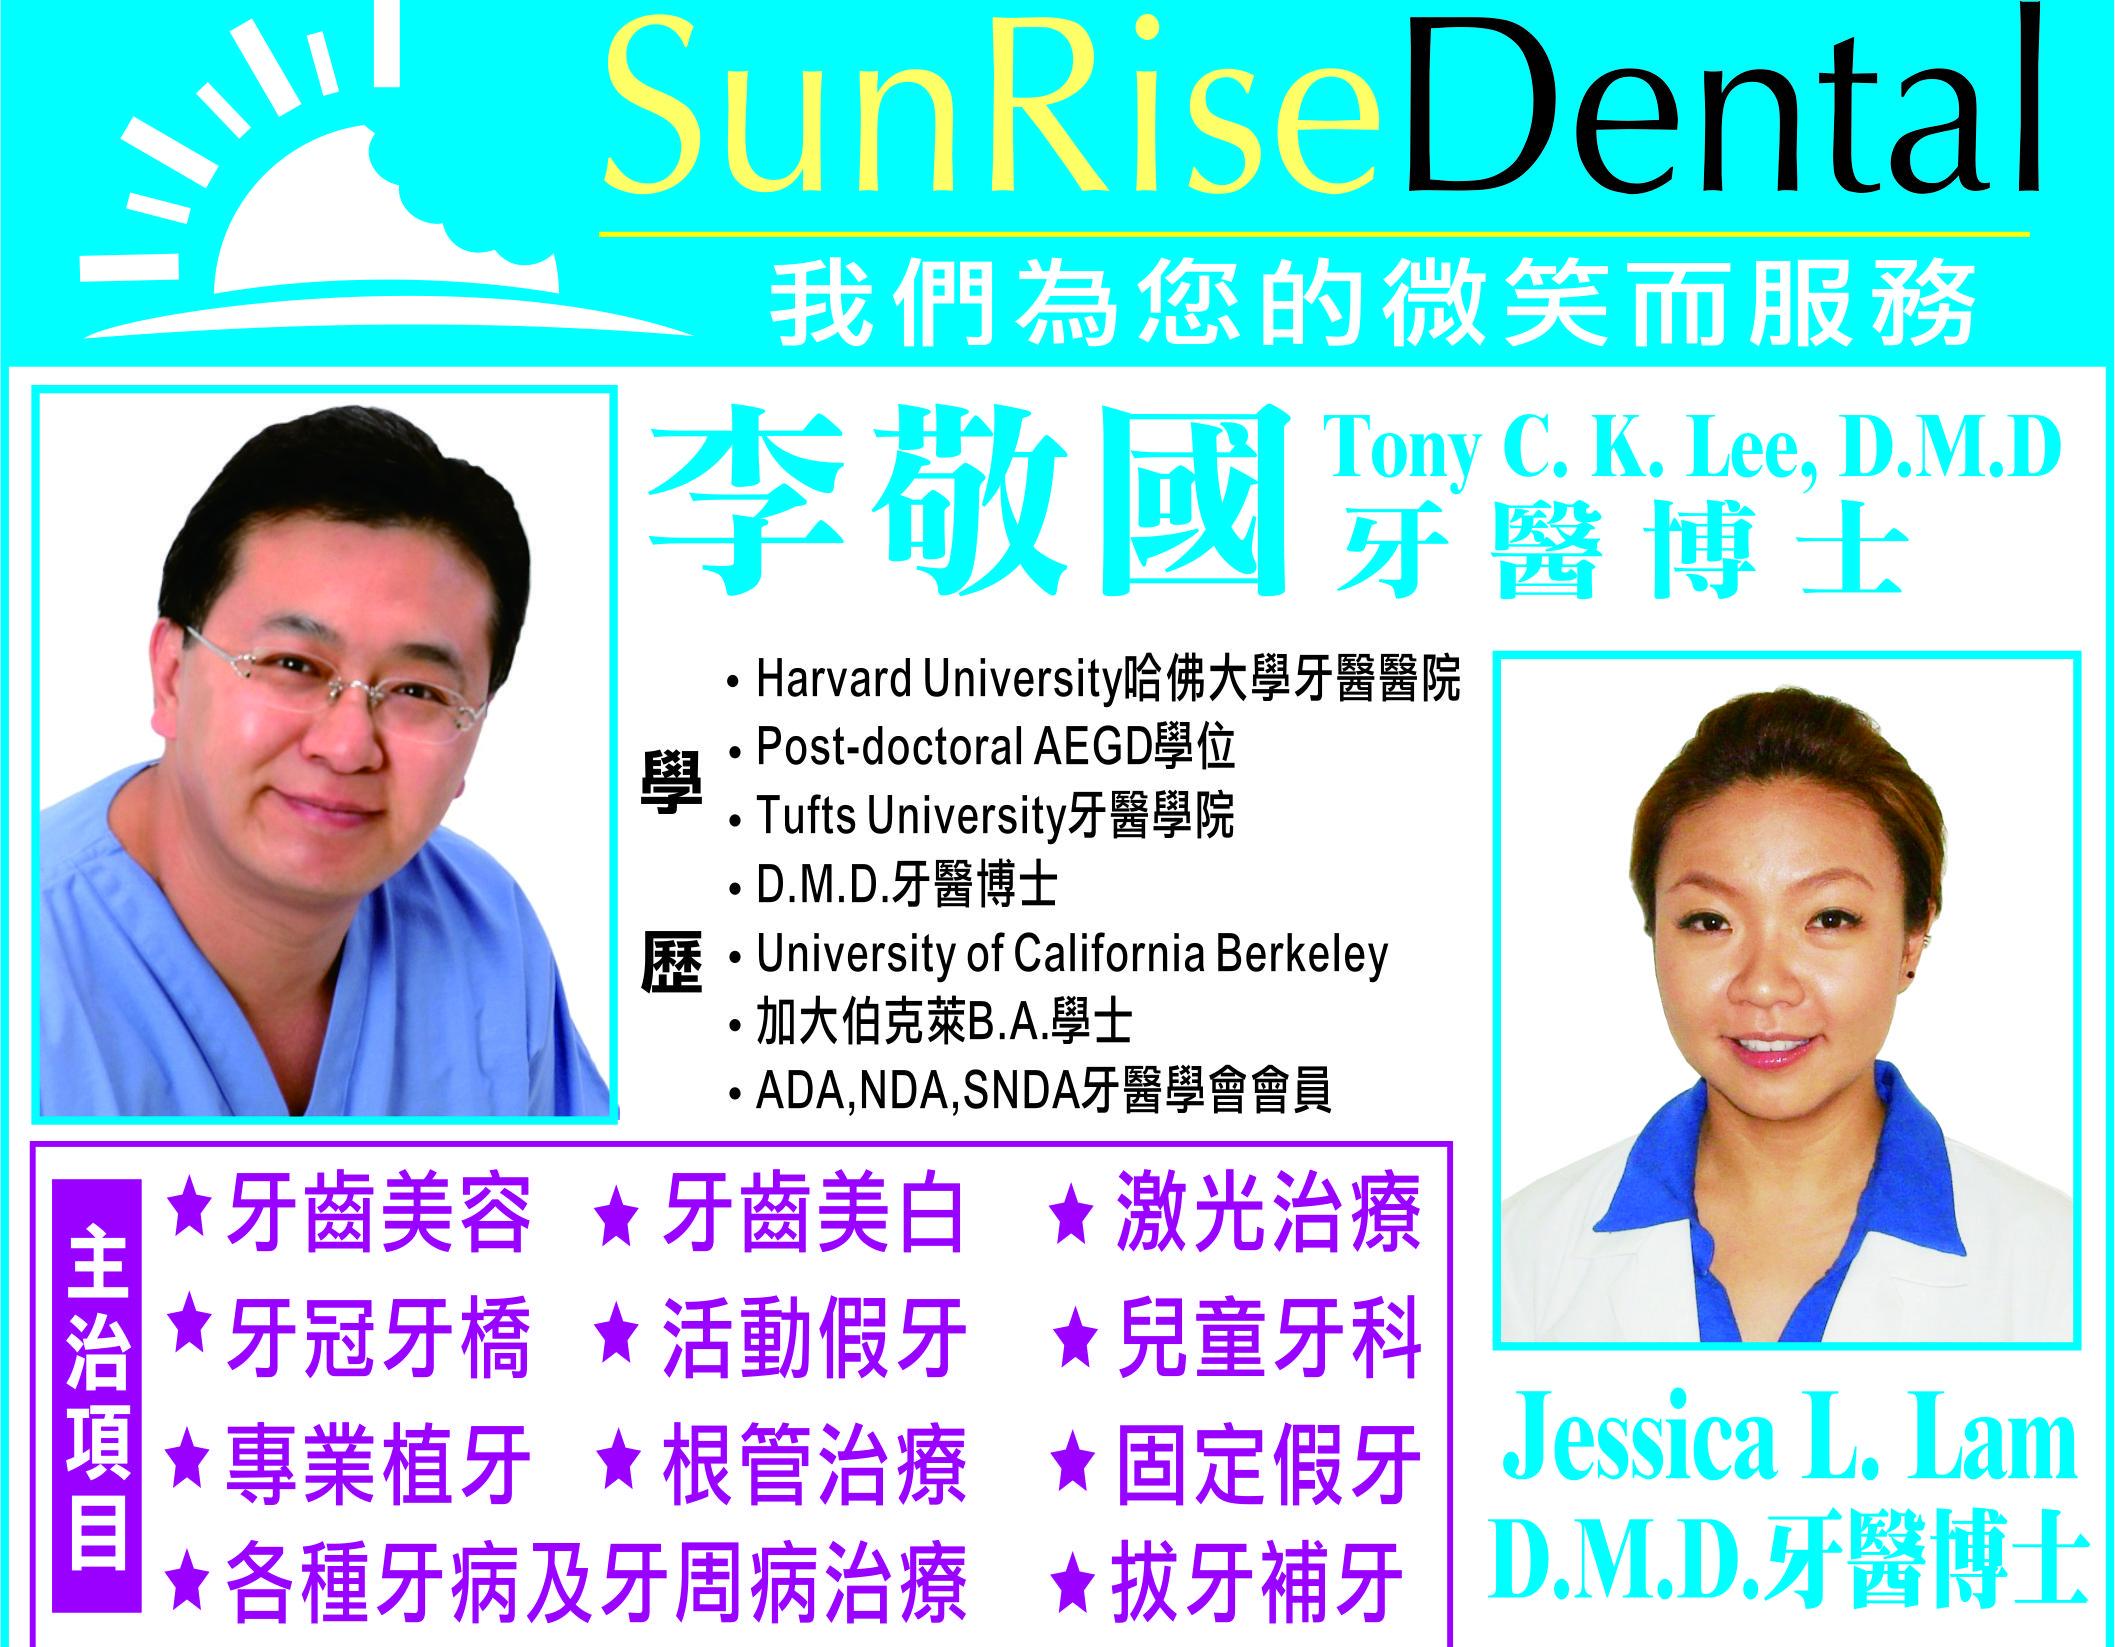 李敬国牙医诊所  Lee, Tony, DMD<